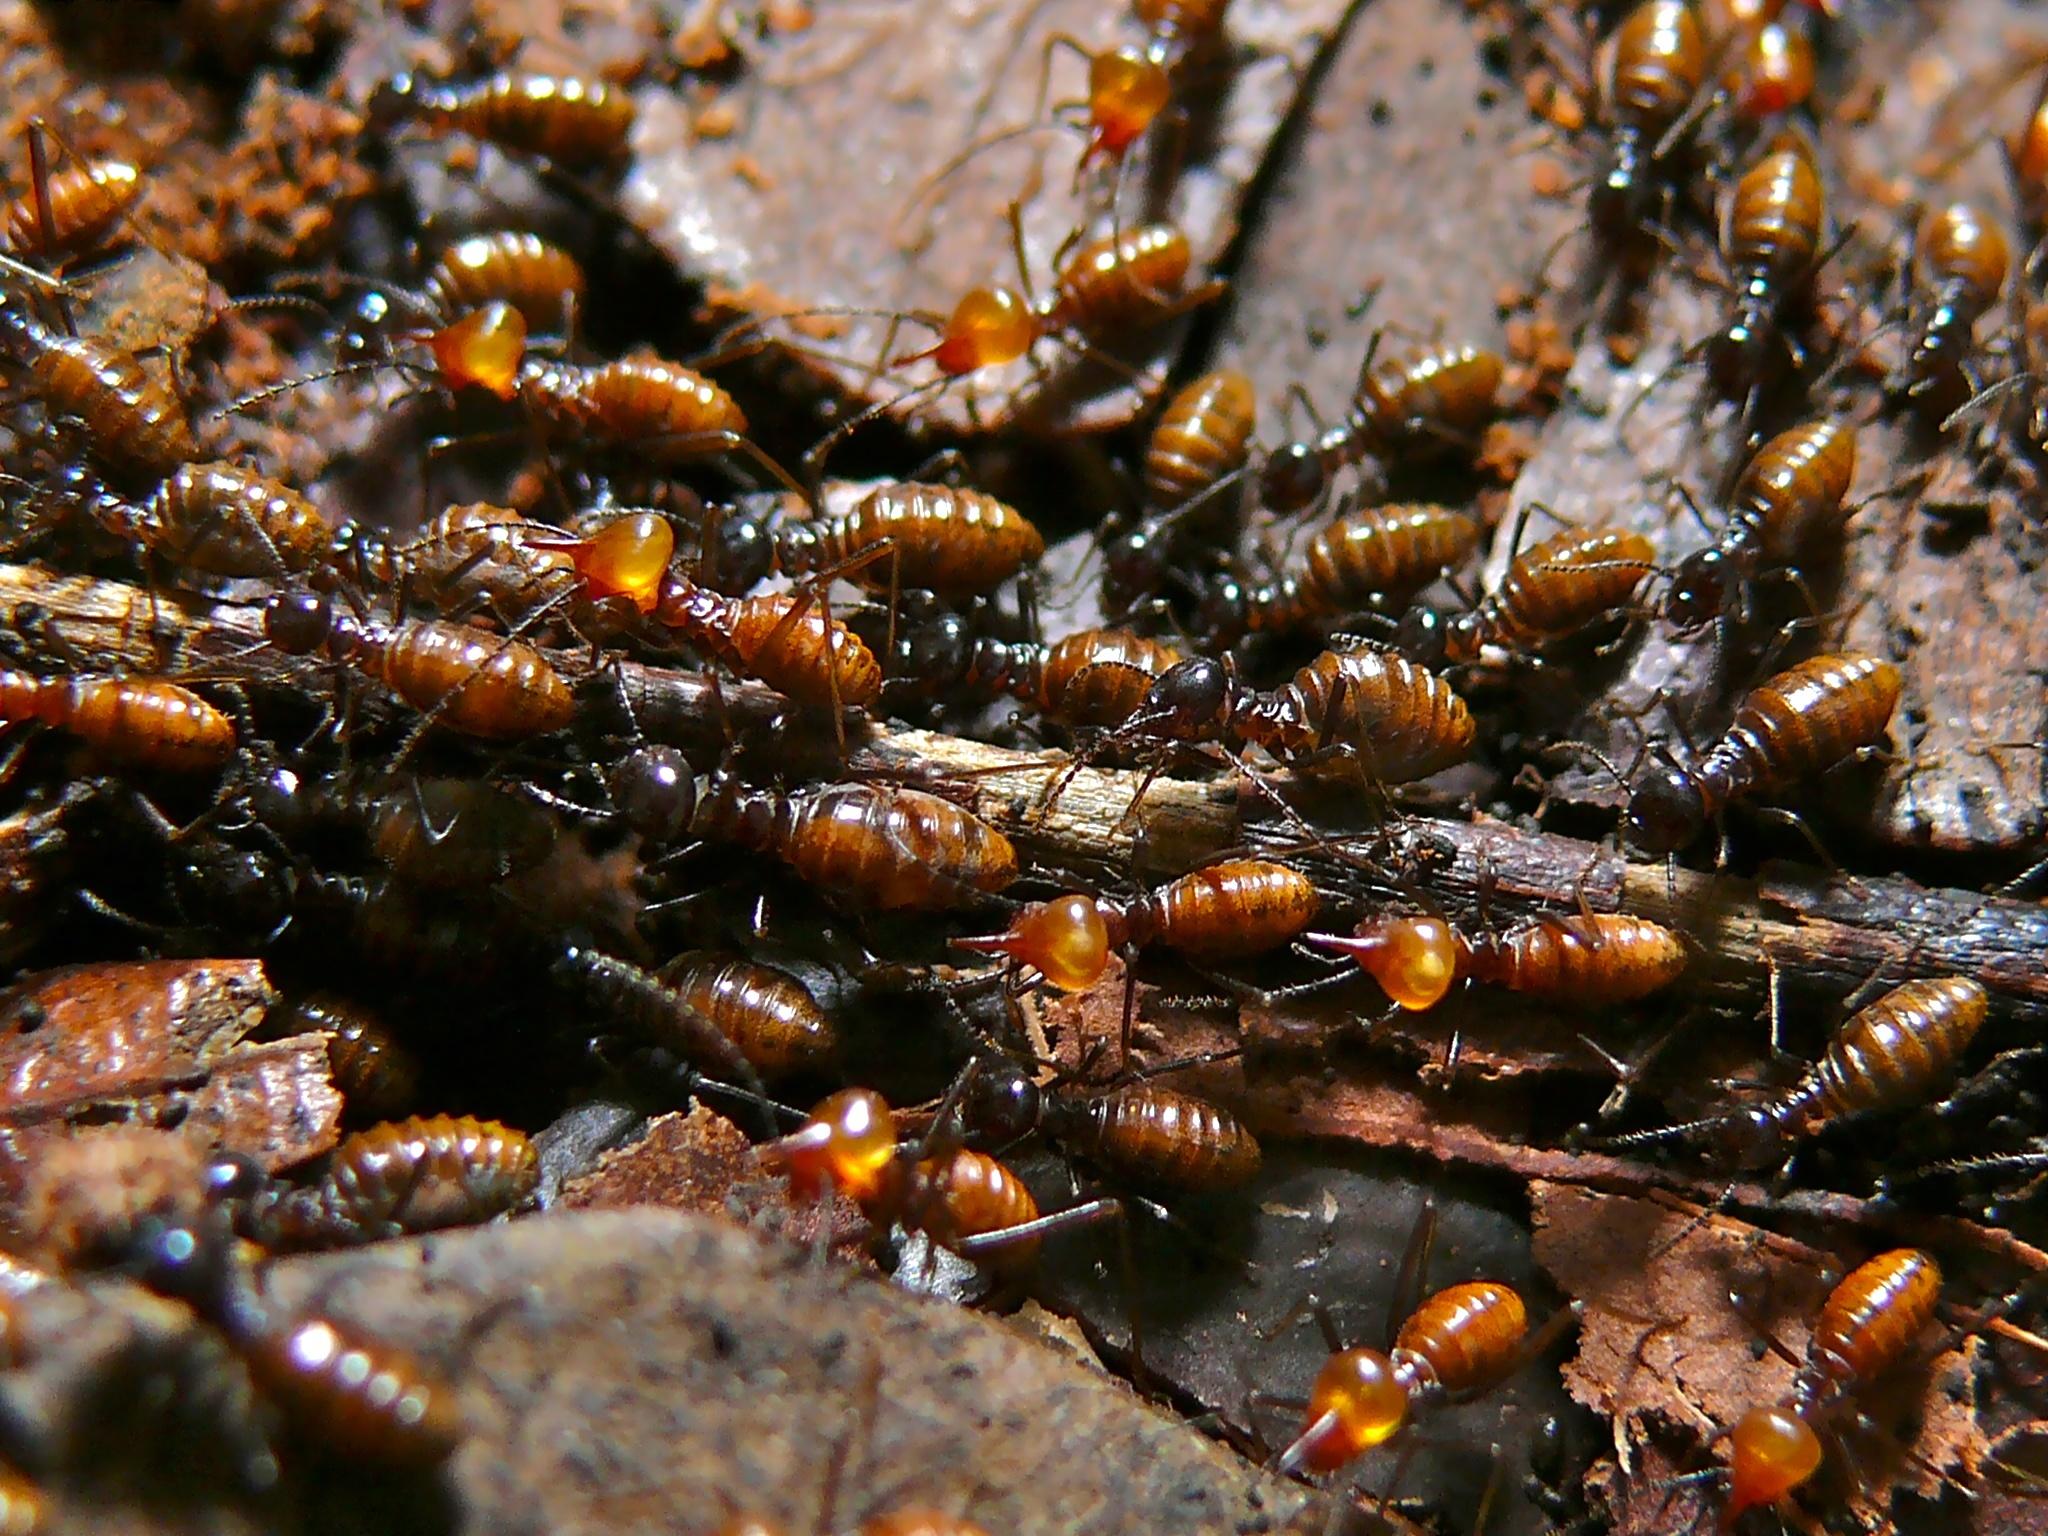 Termites_%28Nasutitermes_sp.%29_%286760731623%29.jpg